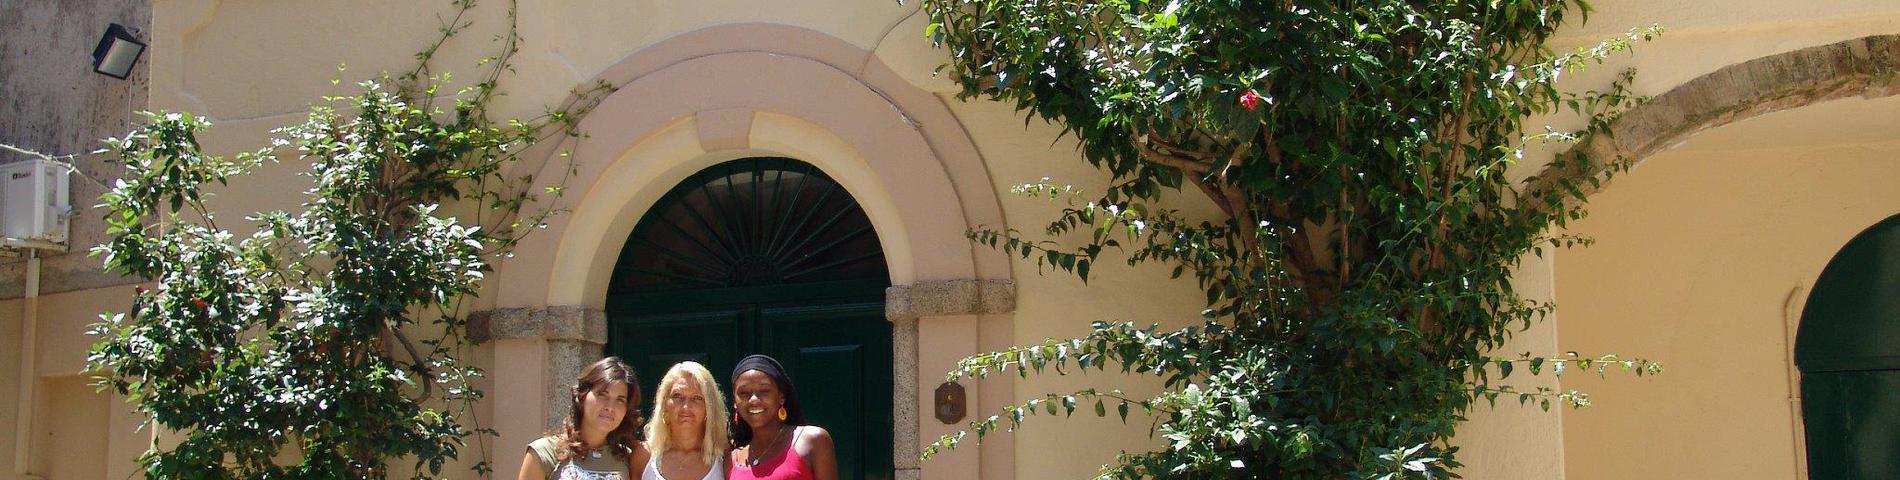 Piccola Universita Italiana صورة 1